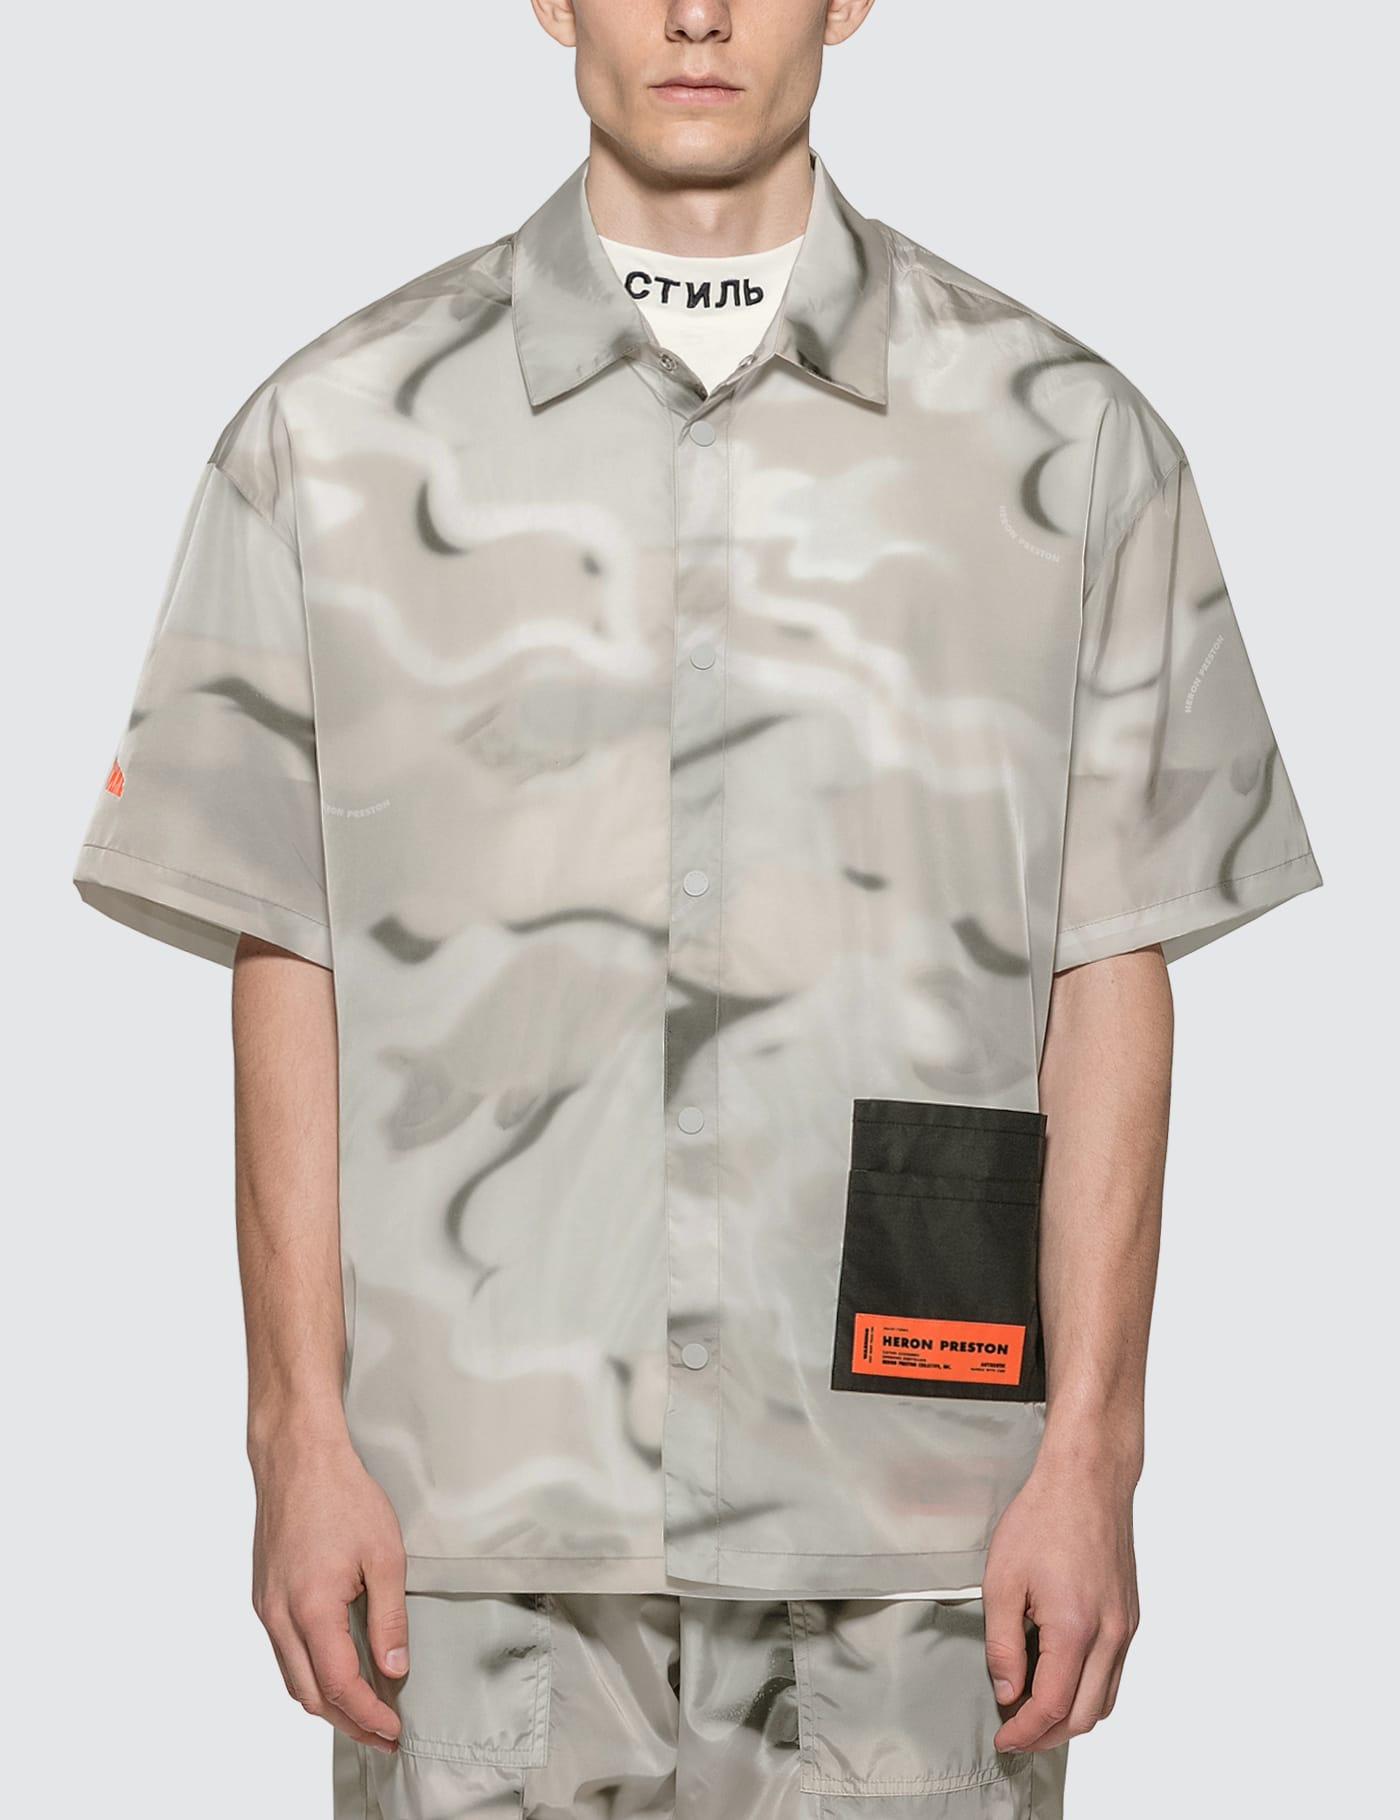 $530 Thom Browne Grey Inverse Check Poplin New Shirt Size 0 1 /&  2 XS S /& M